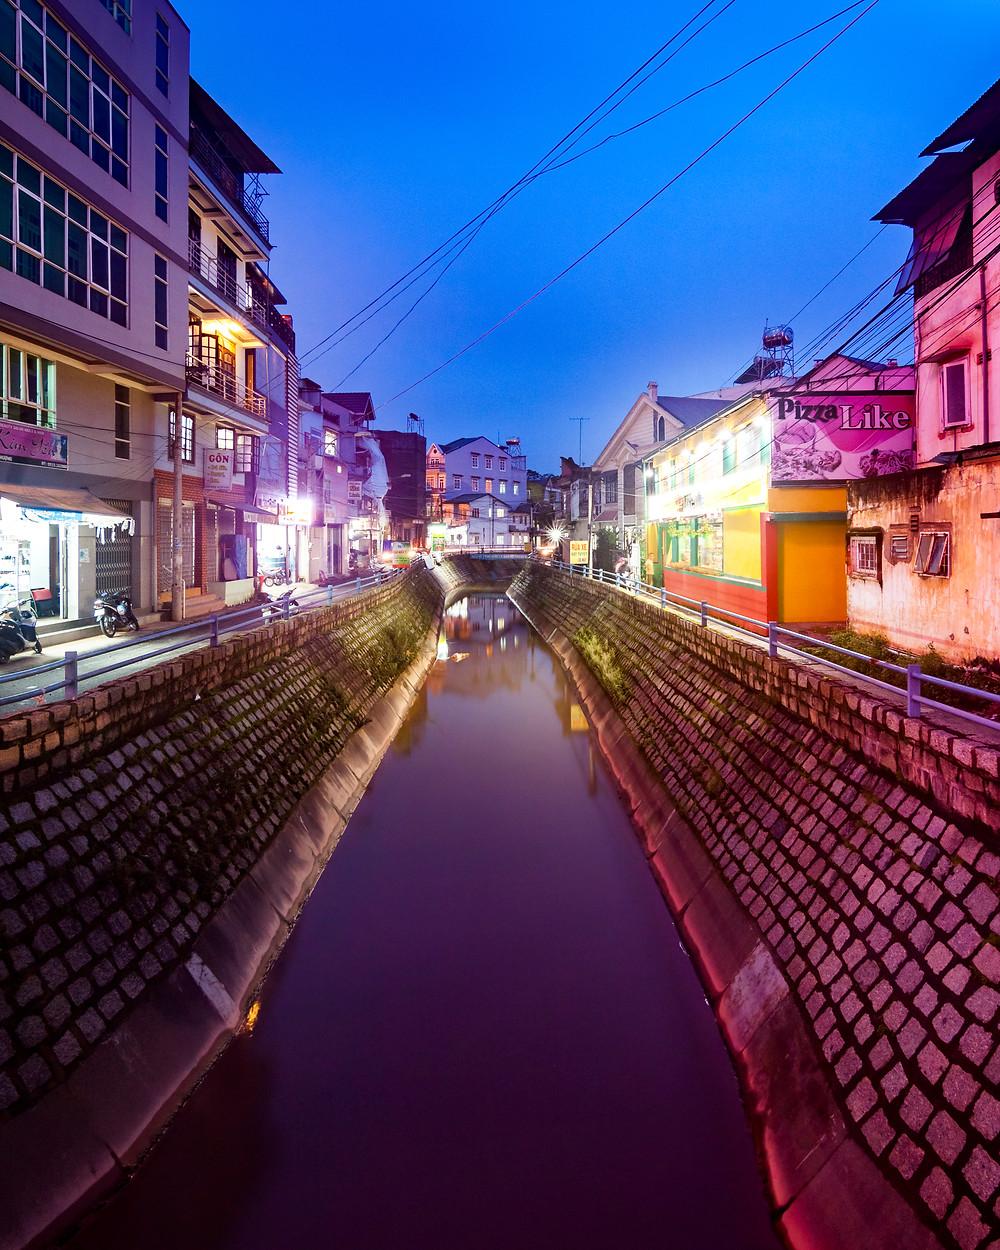 Canal/River In Da Lat, Vietnam at Night/Blue Hour